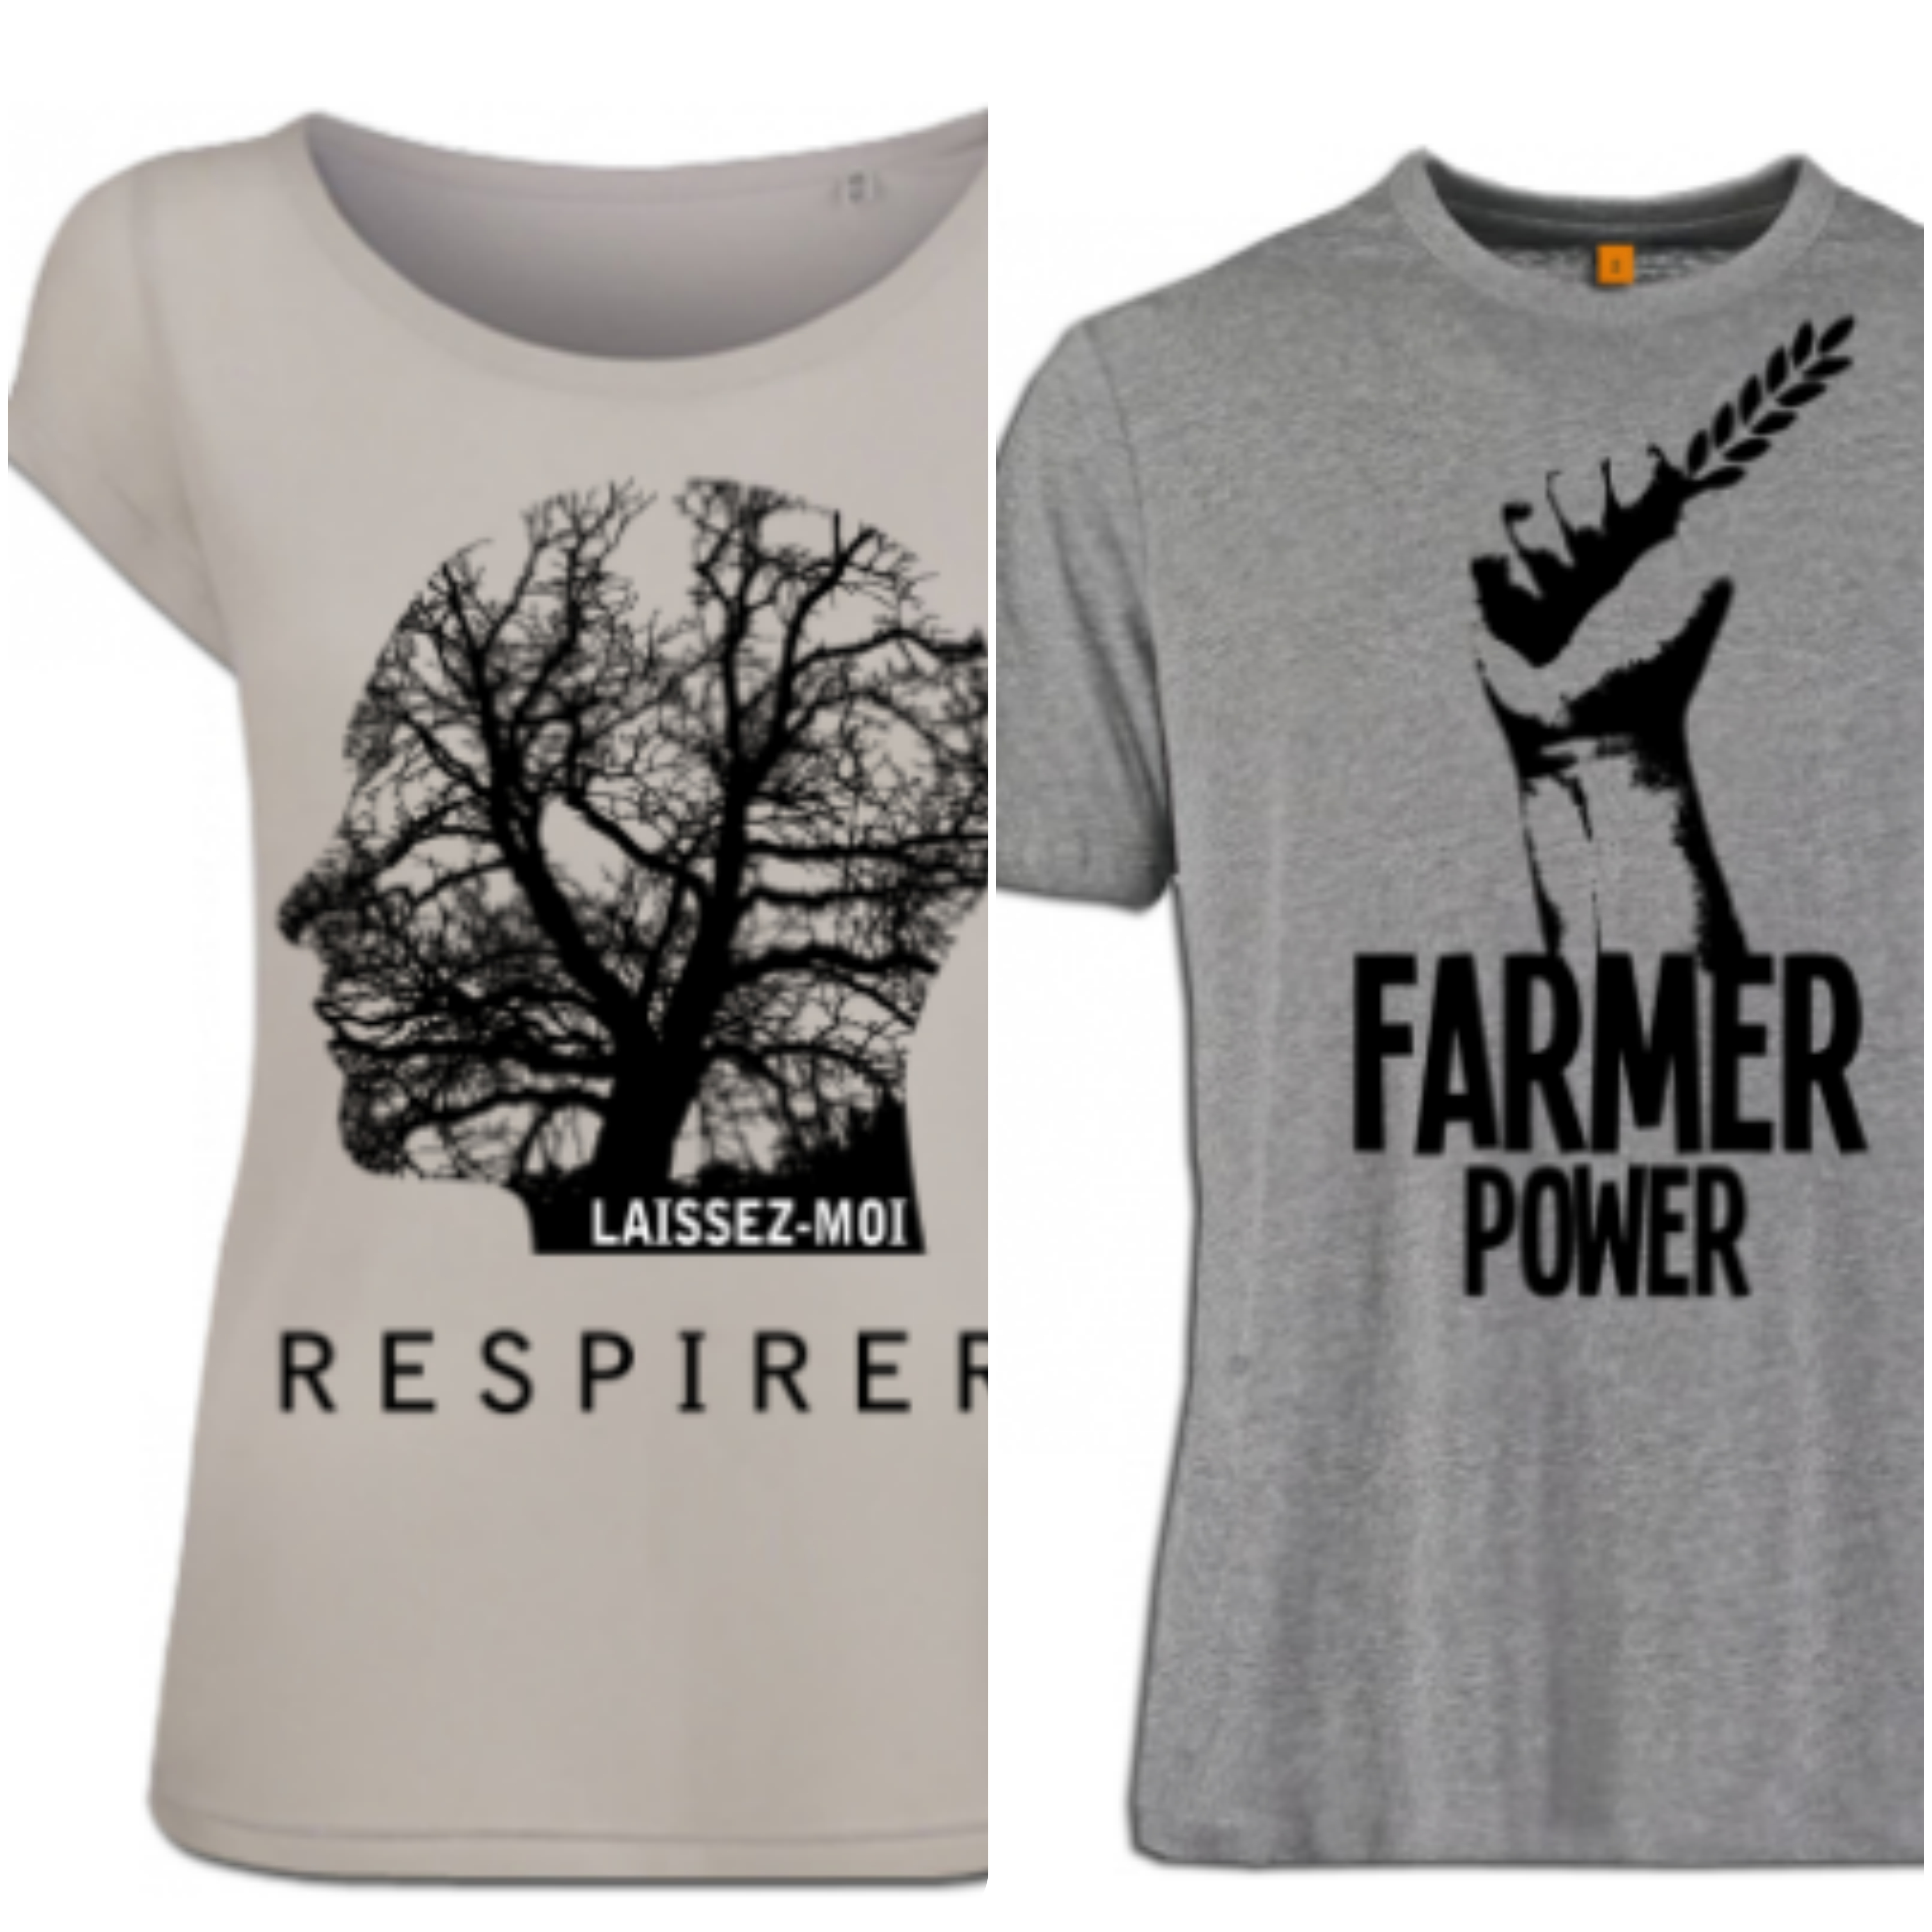 T_shirt-1495652142.jpg